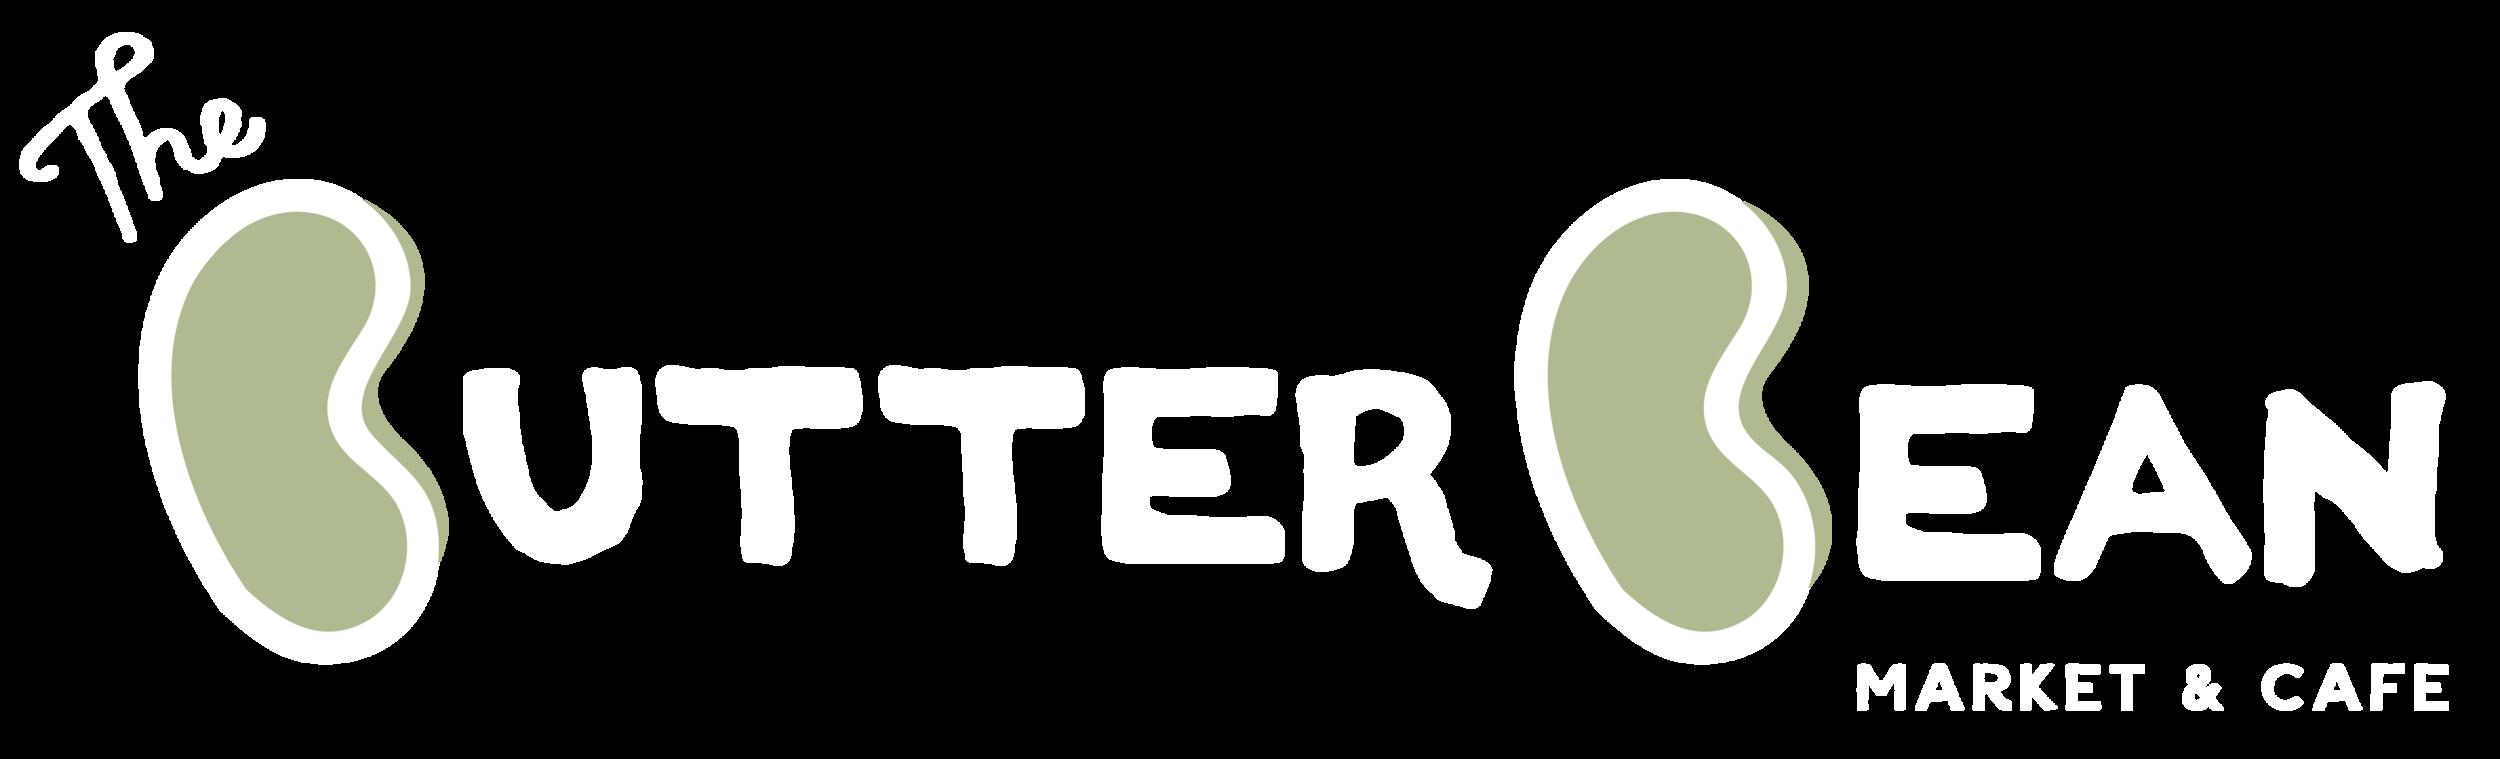 BB_main-logo_reverse.png